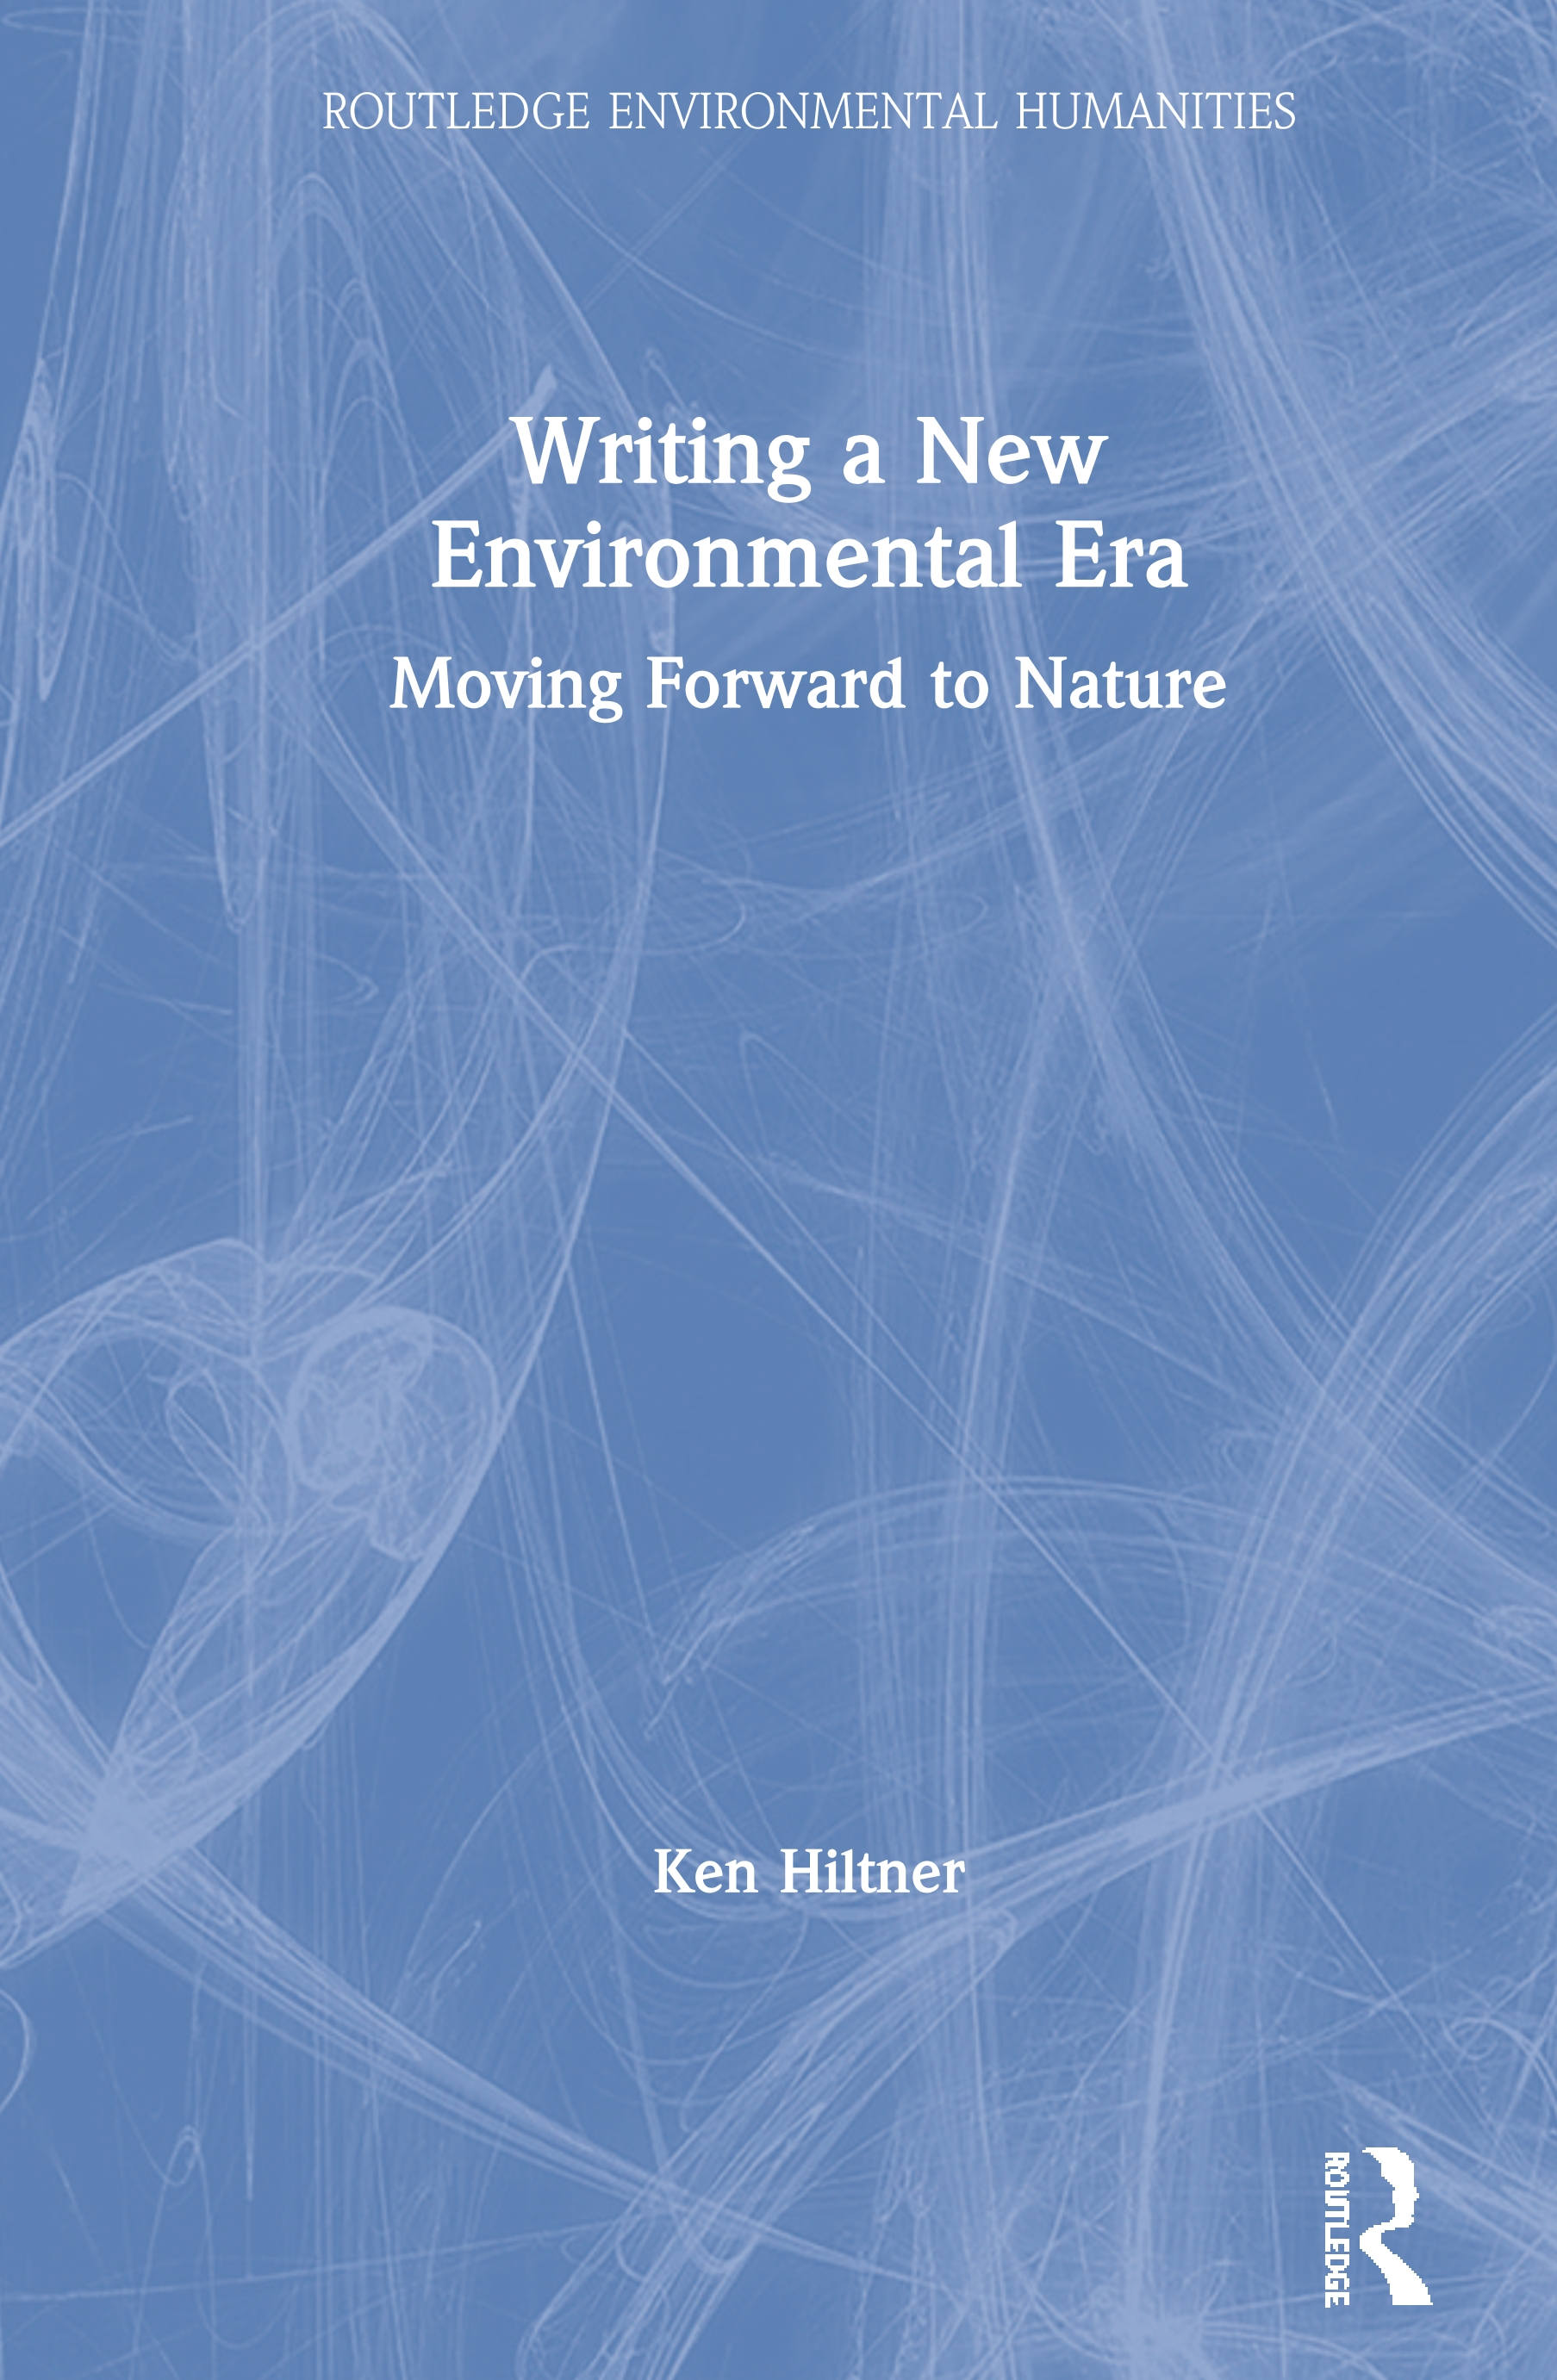 Writing a New Environmental Era: Moving forward to nature book cover